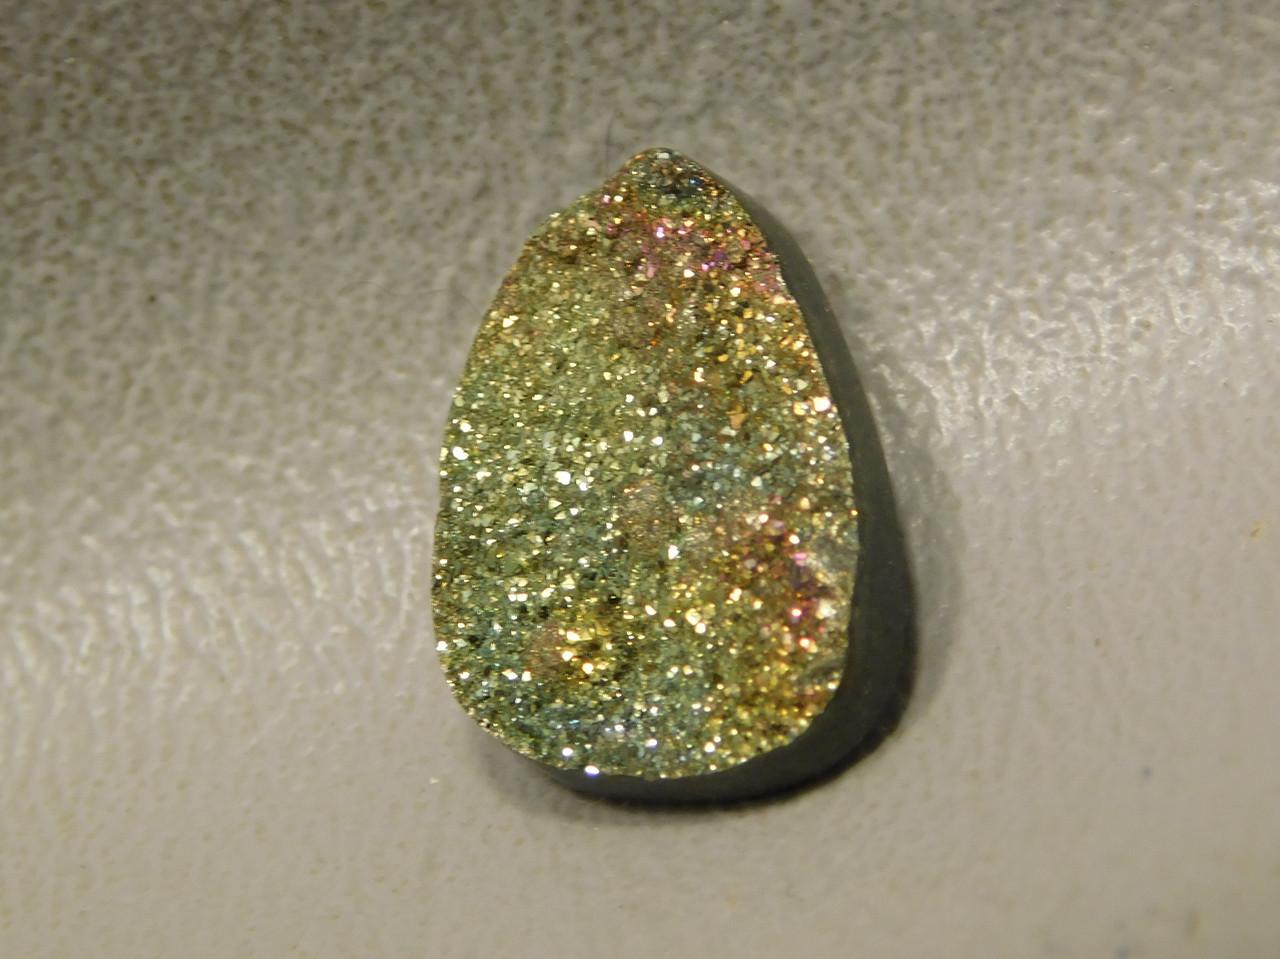 Iridescent Pyrite Small Stone Cabochon Jewelry Making  Supplies #10